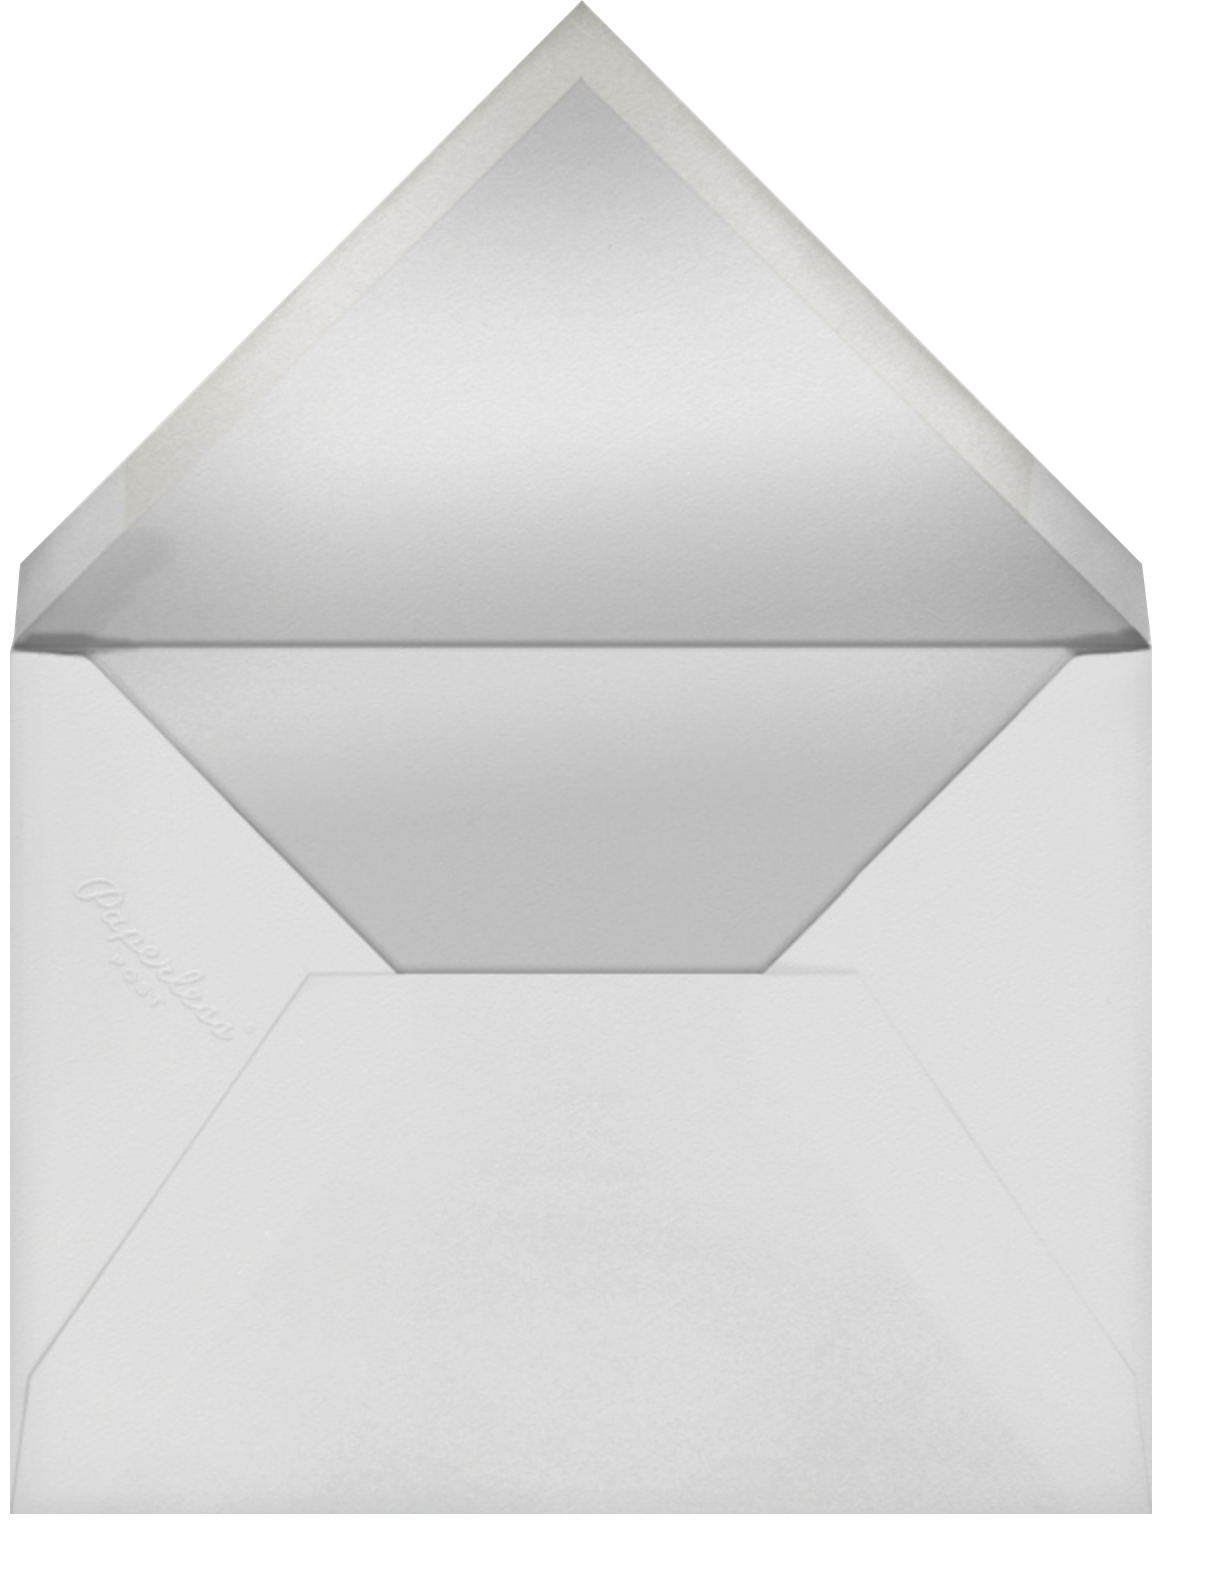 Heather and Lace (Menu) - Celadon/Gold - Rifle Paper Co. - Envelope